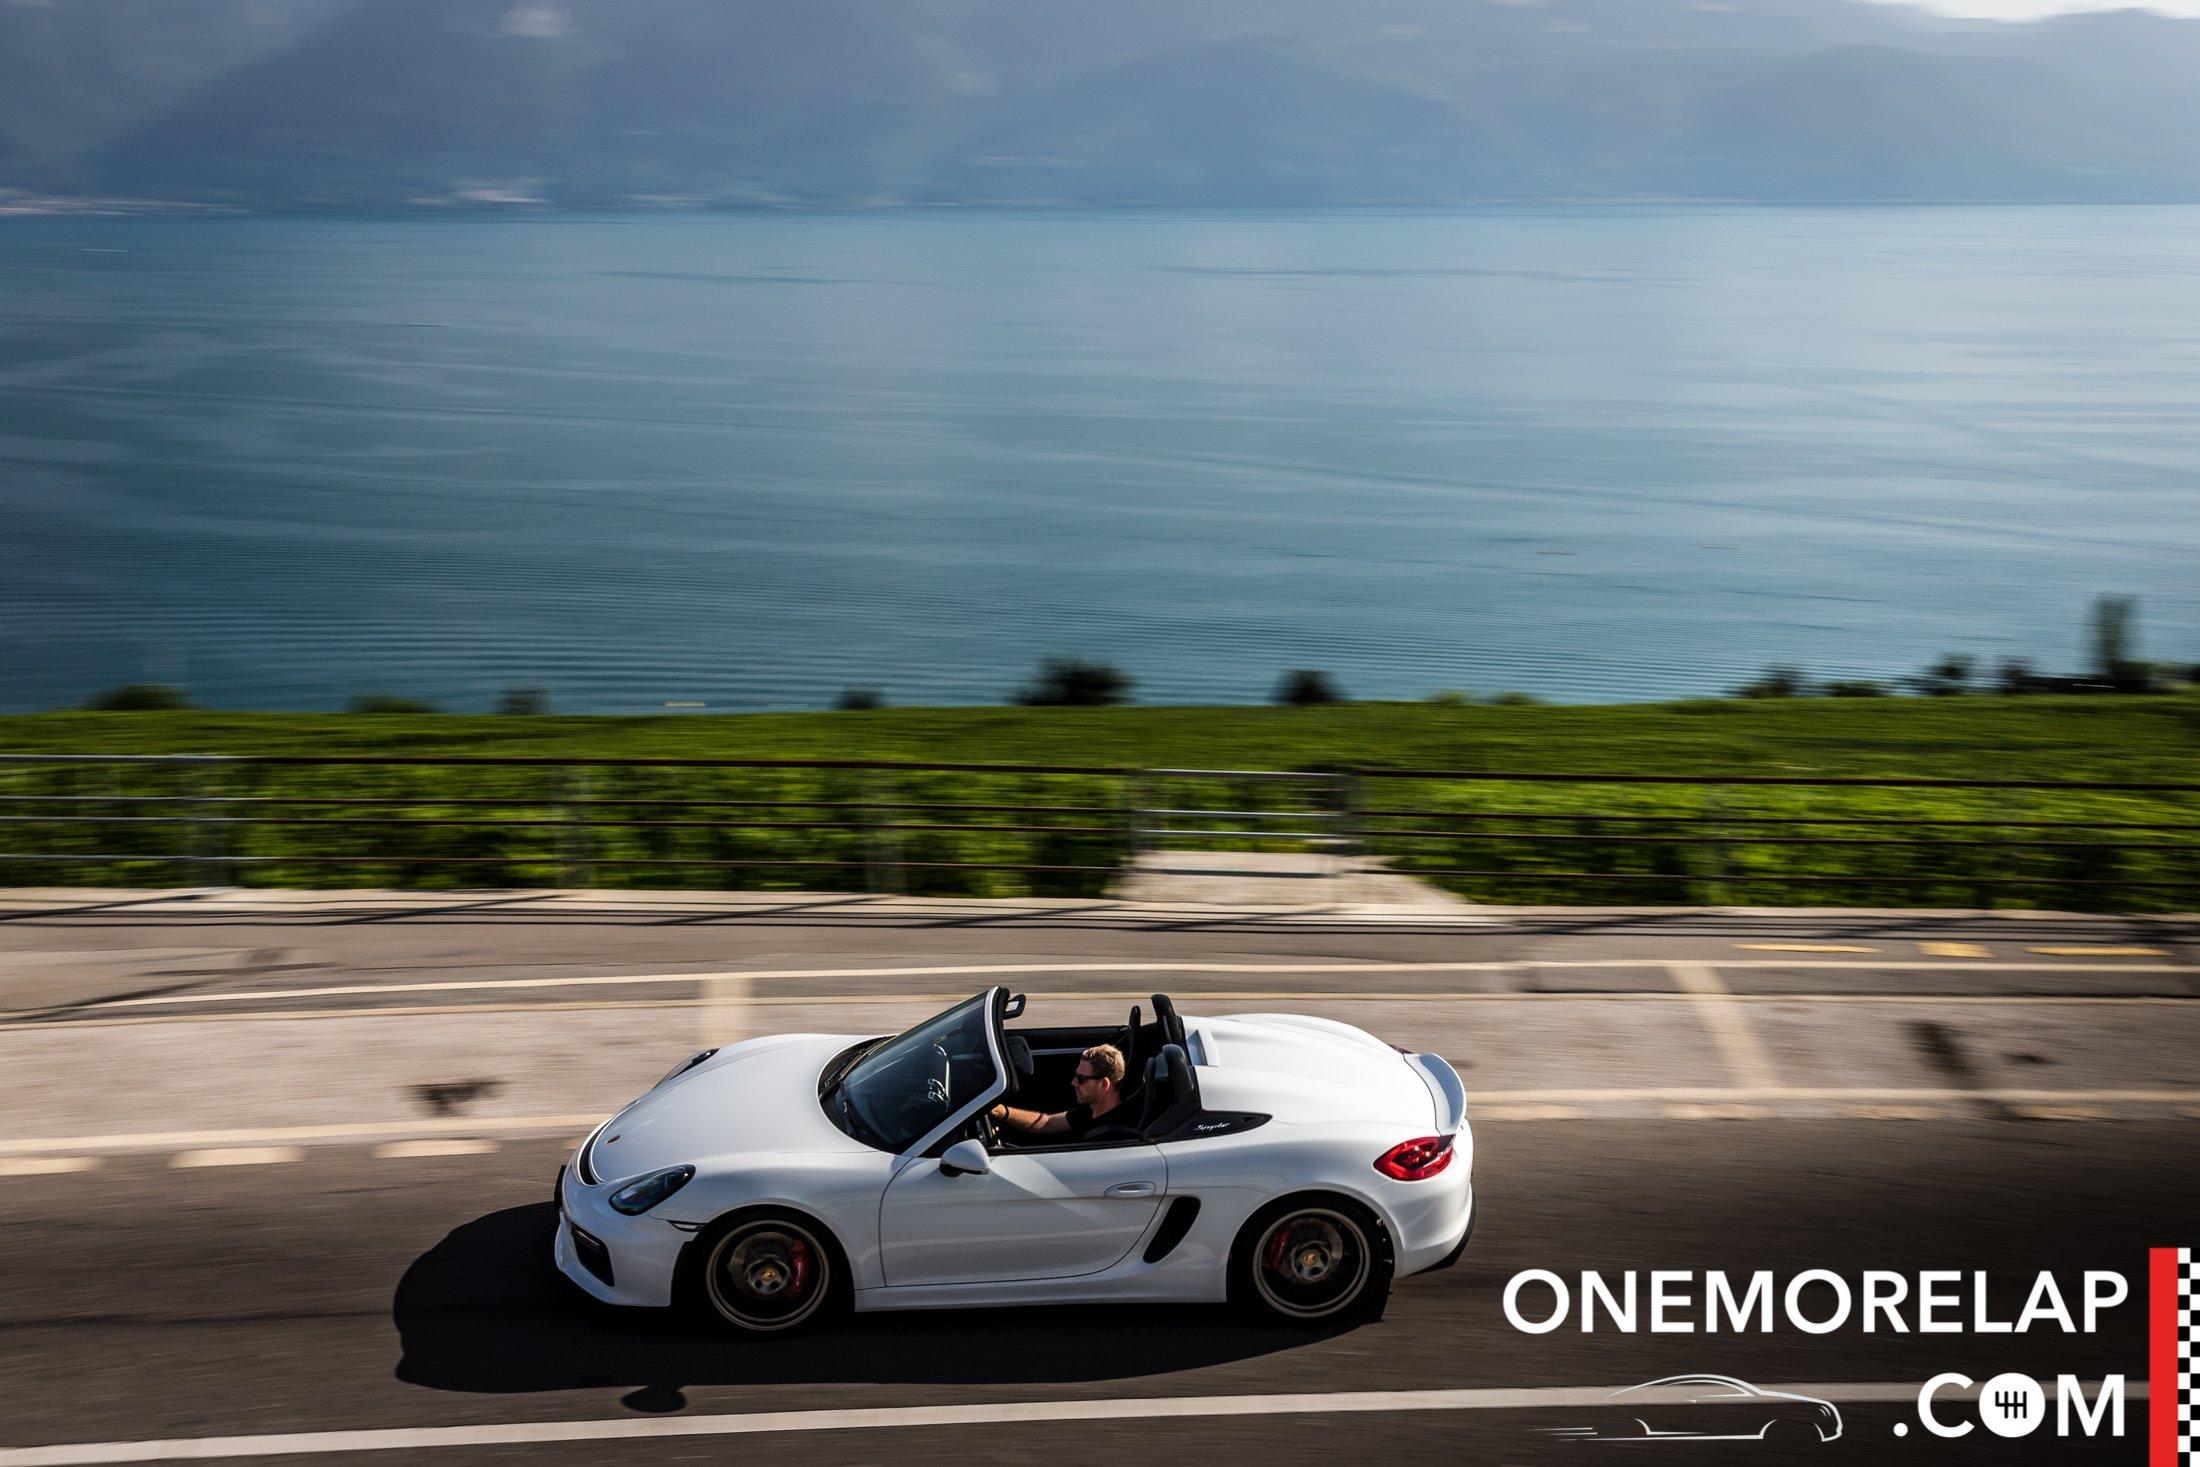 Kurztest: Porsche Boxster Spyder 2015